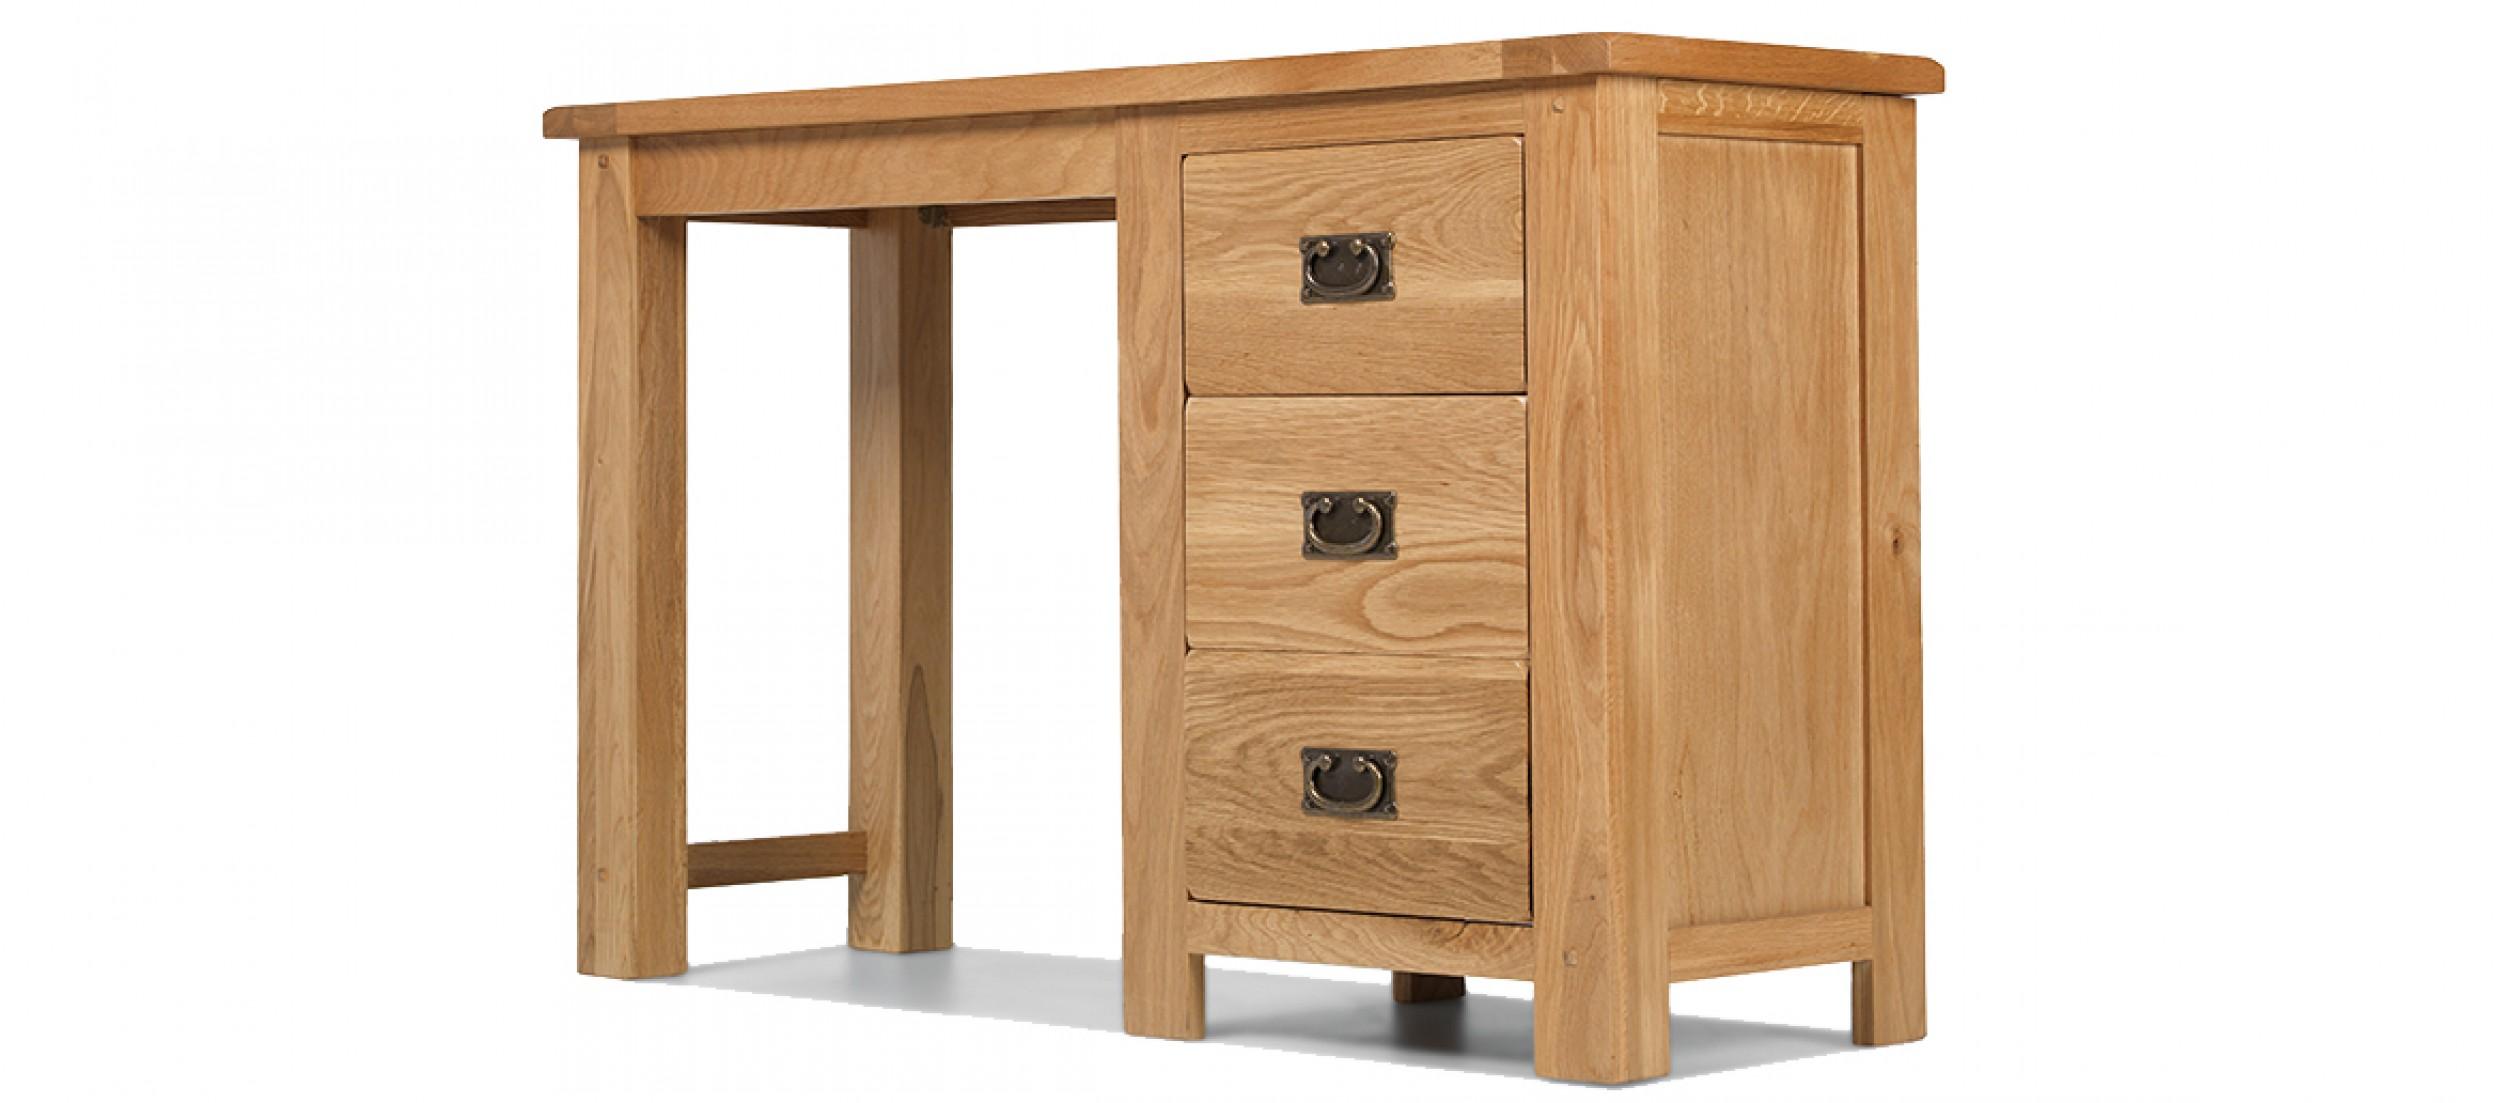 Rustic Oak Dressing Table Quercus Living - Rustic oak dressing table